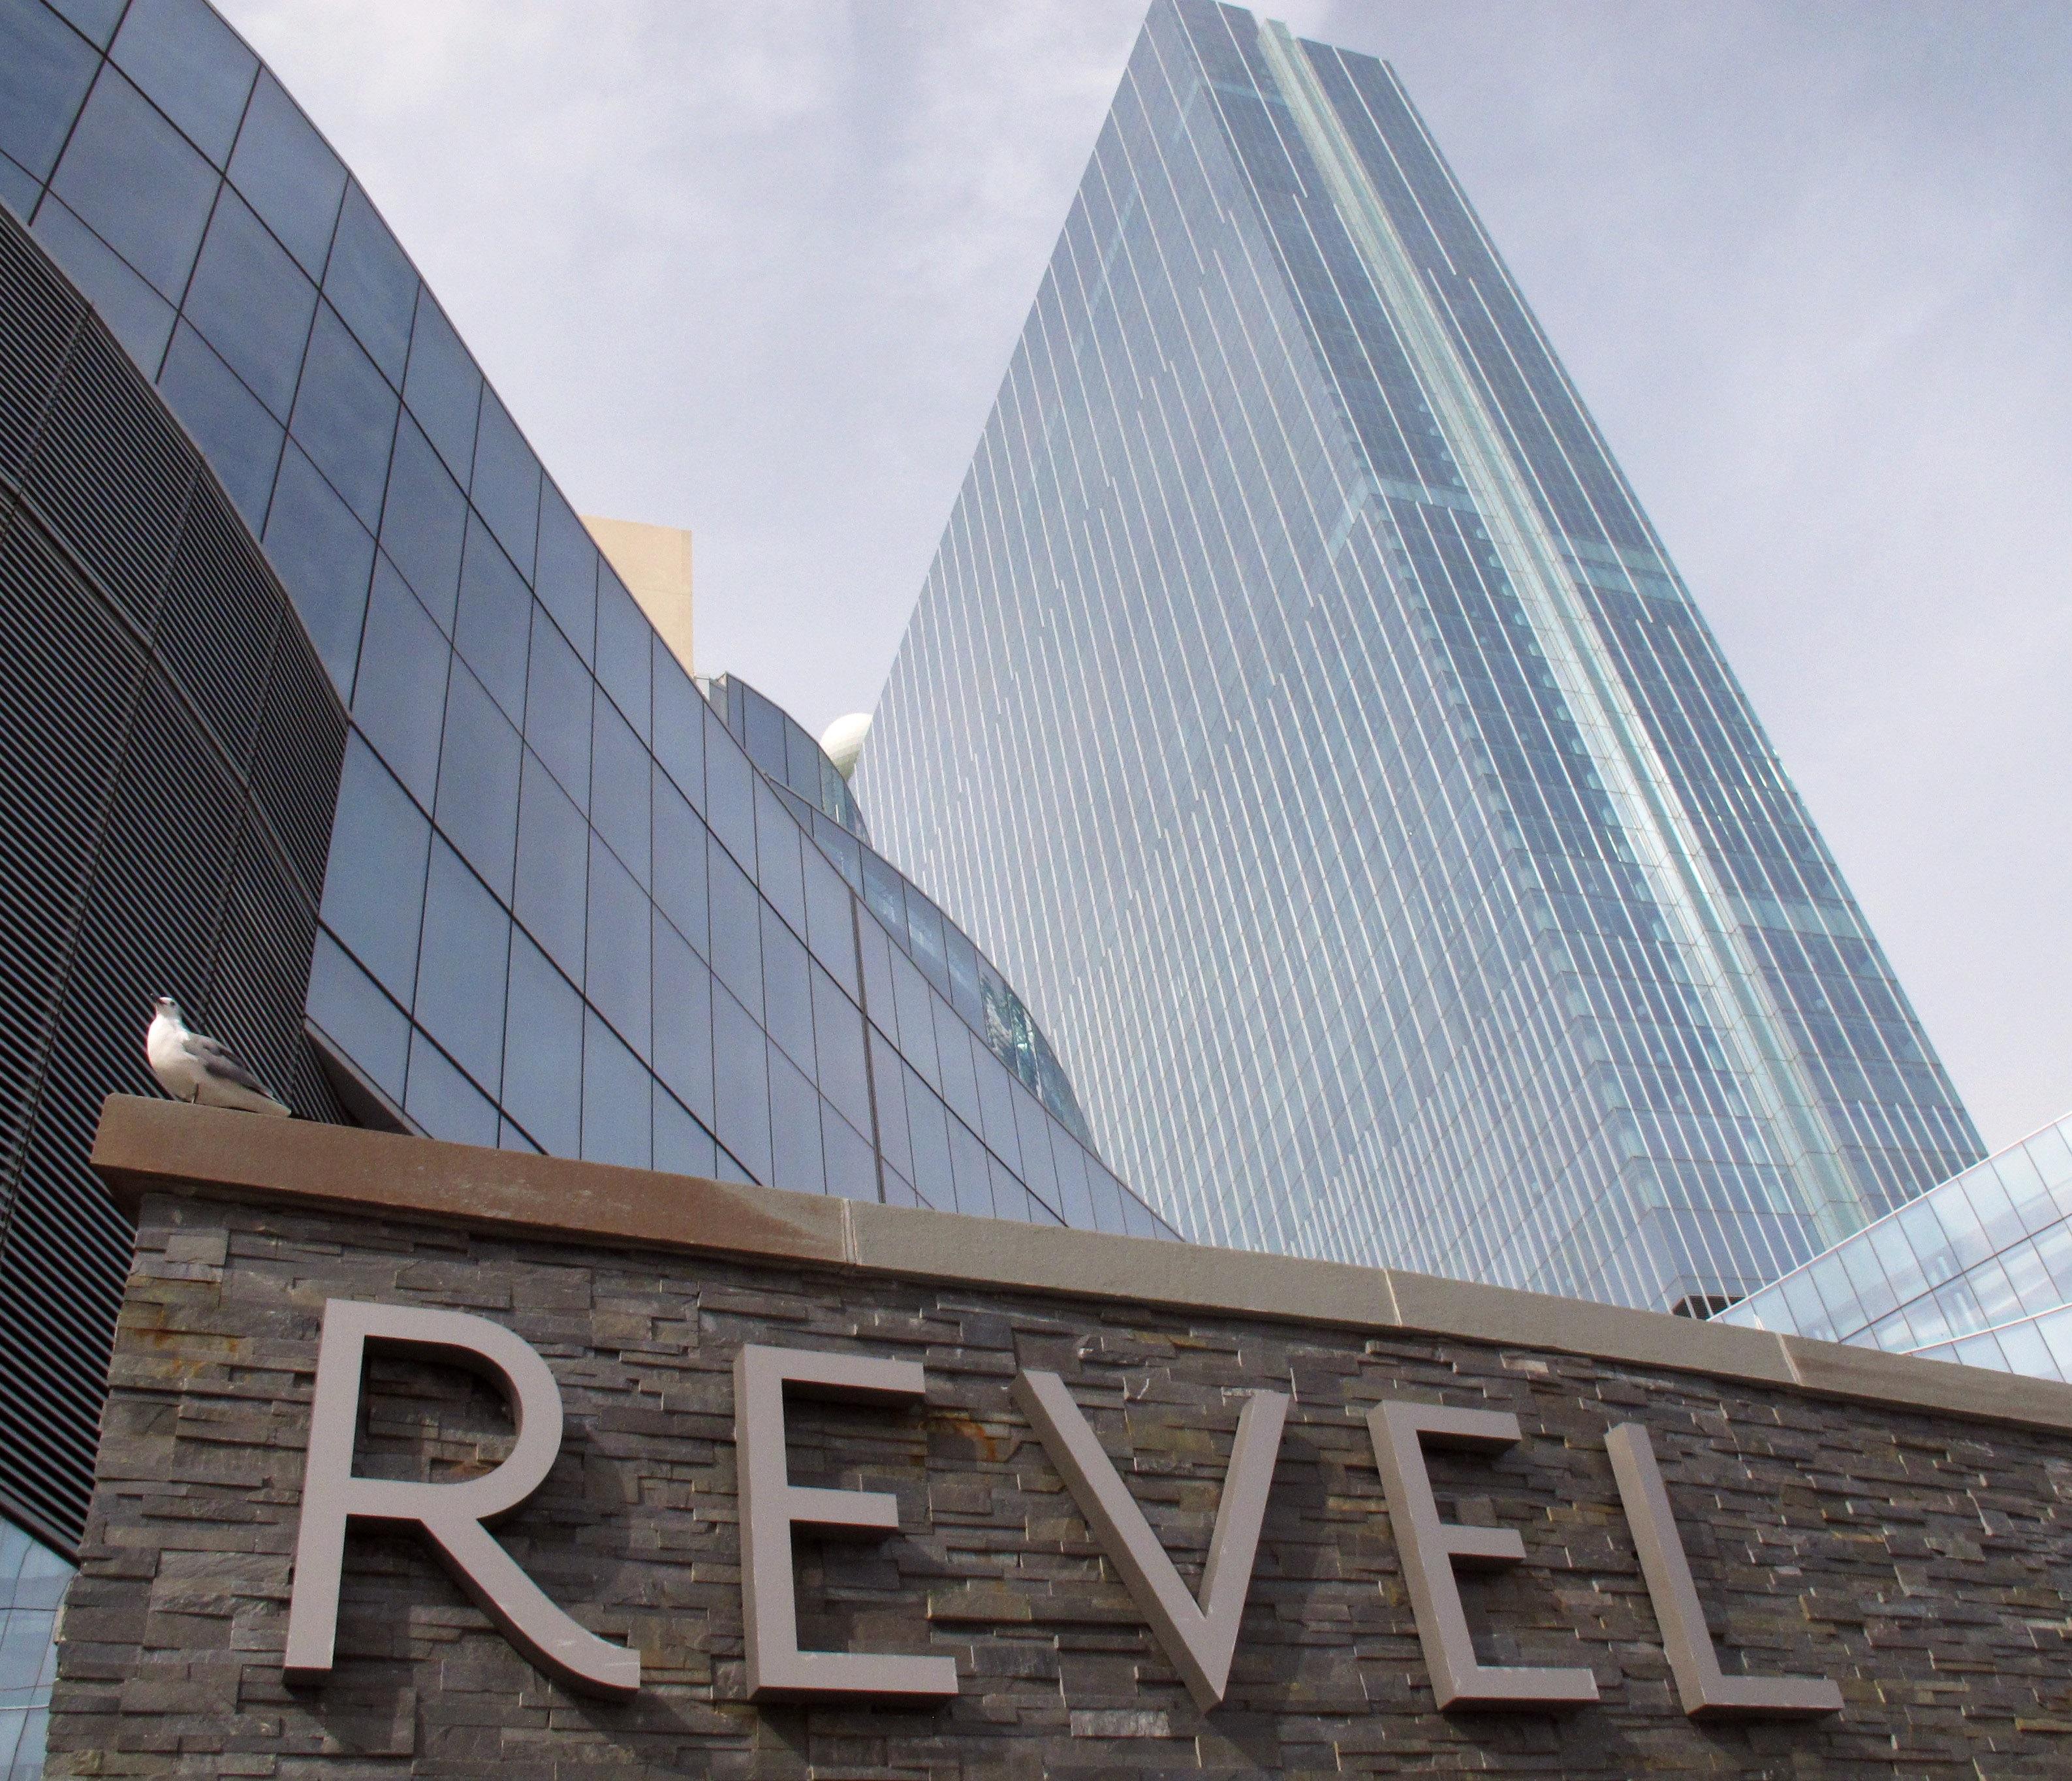 Revel casino director of marketing